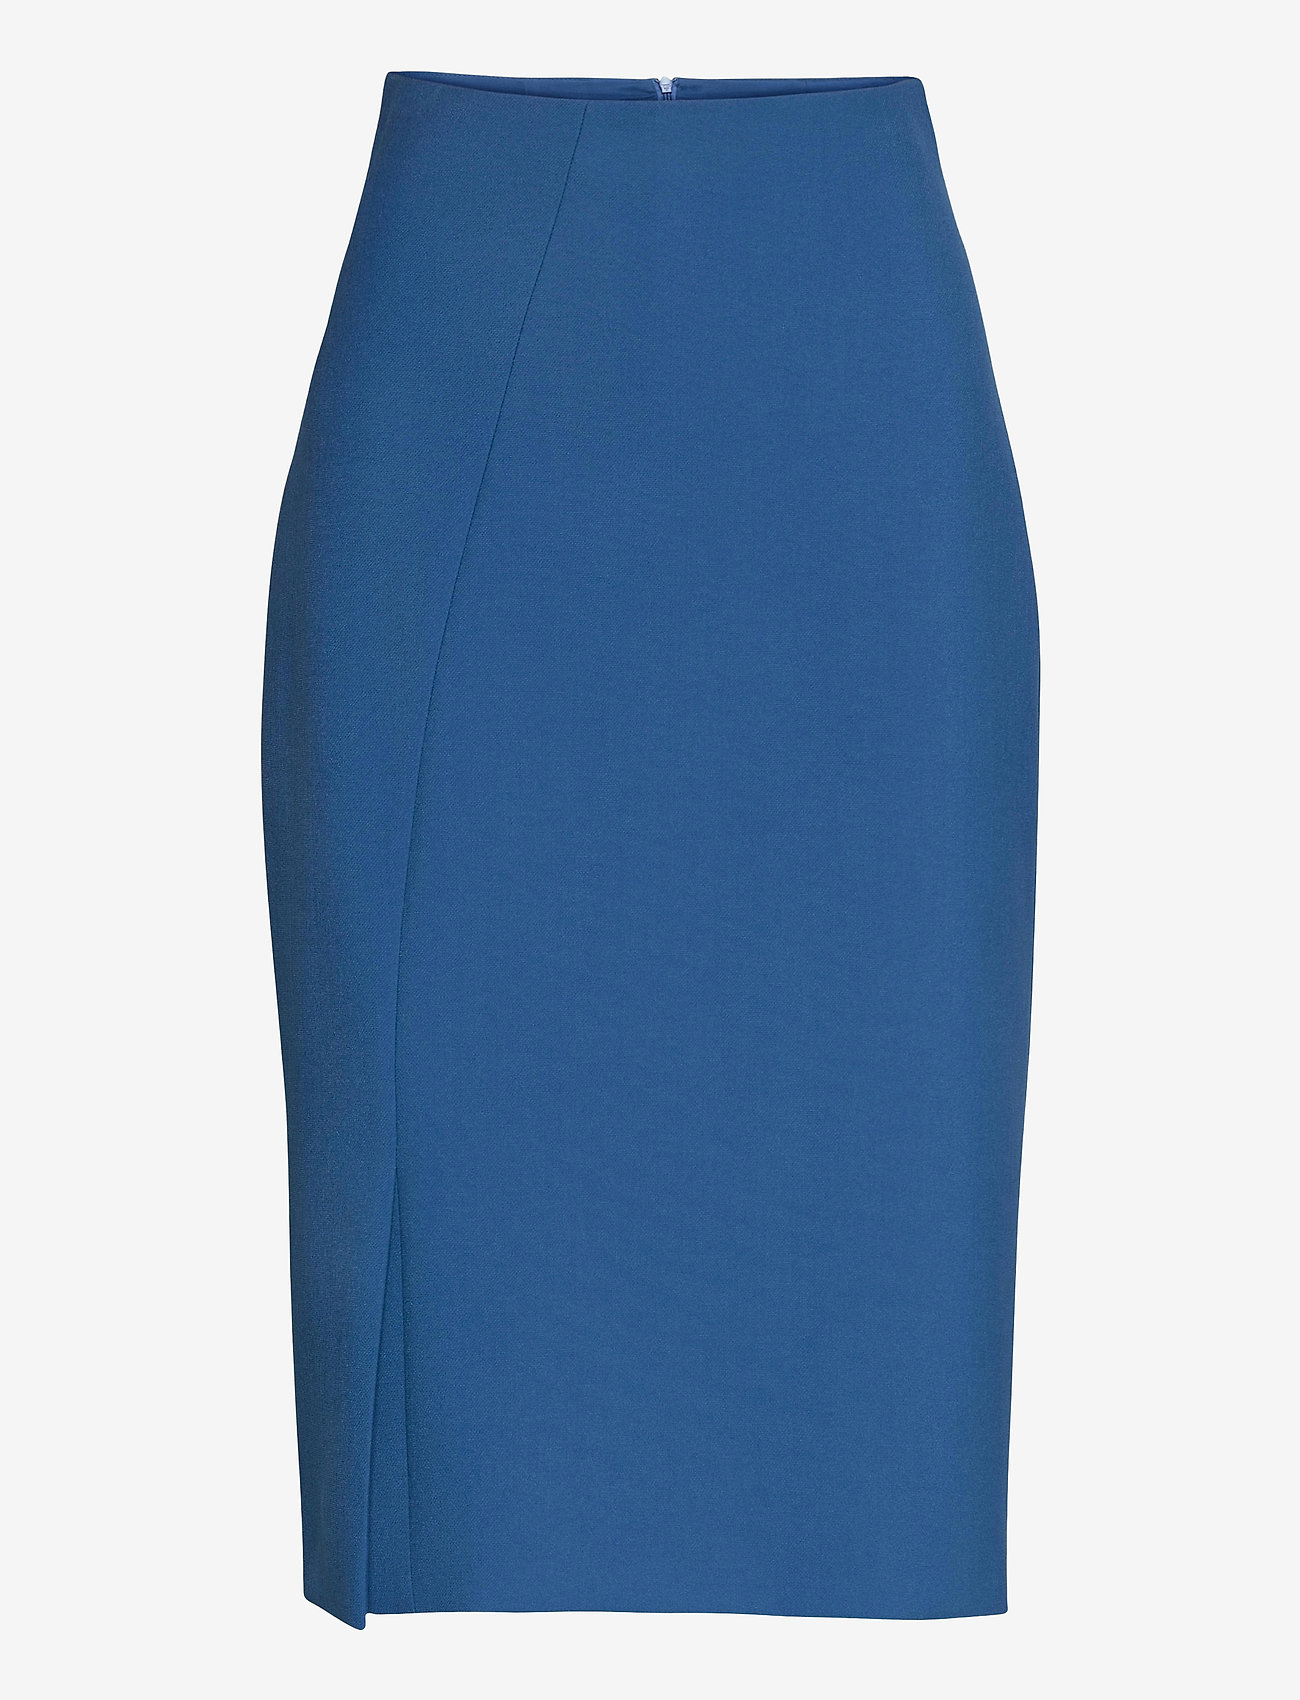 BOSS - Vianno1 - jupes midi - open blue - 0